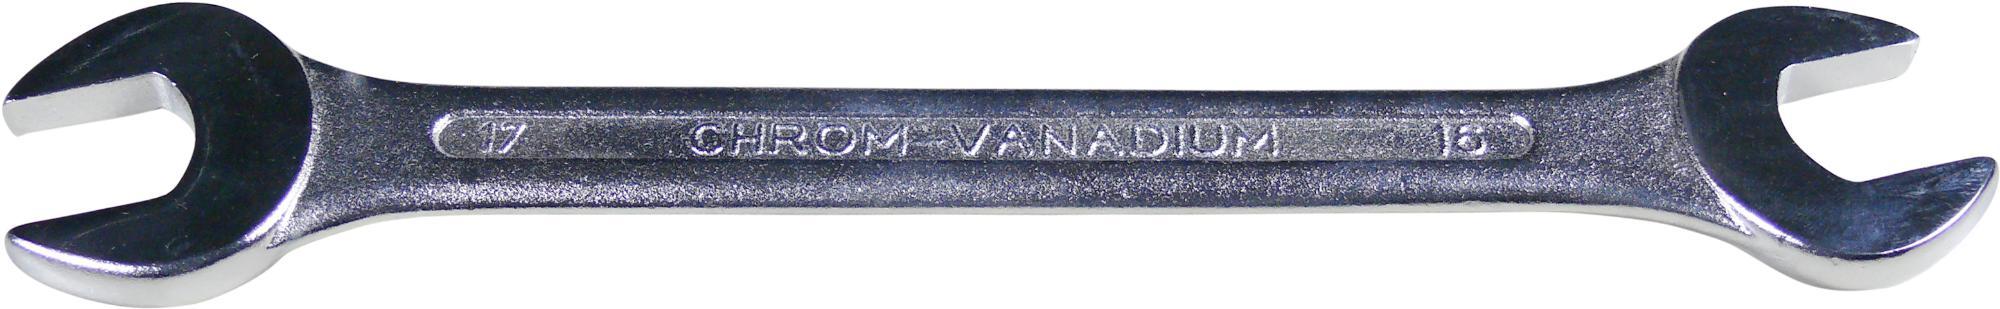 Kľúč vidlica-vidlica, 30x32 mm